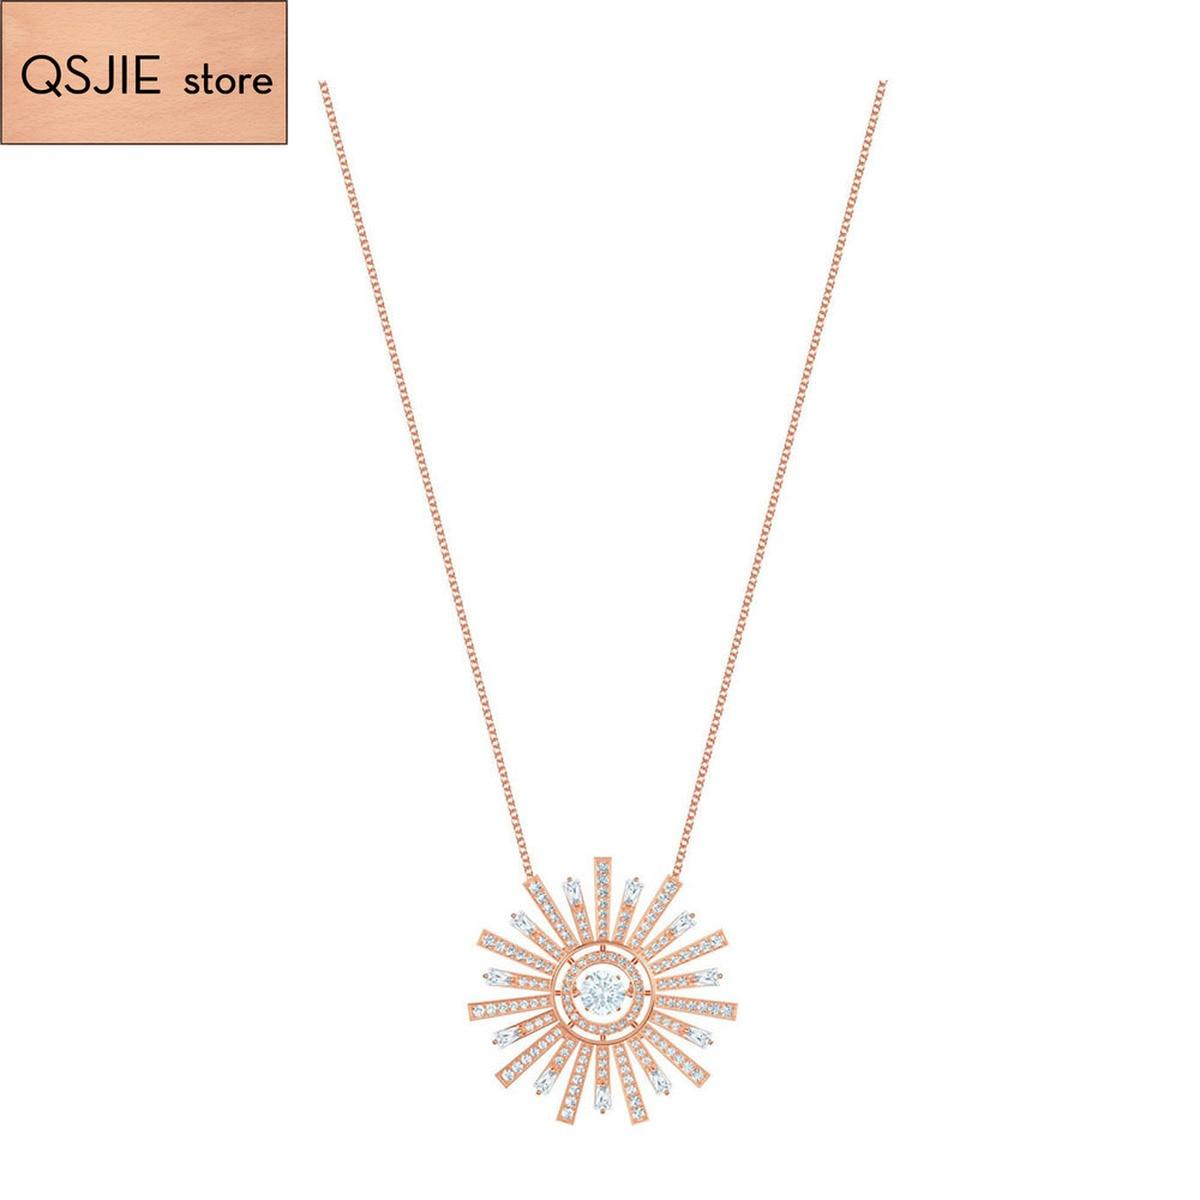 QSJIE High quality SWA. Fashionable, fresh and shiny crystal luxury jewelry solar cocktail Necklace Glamorous fashion jewelry